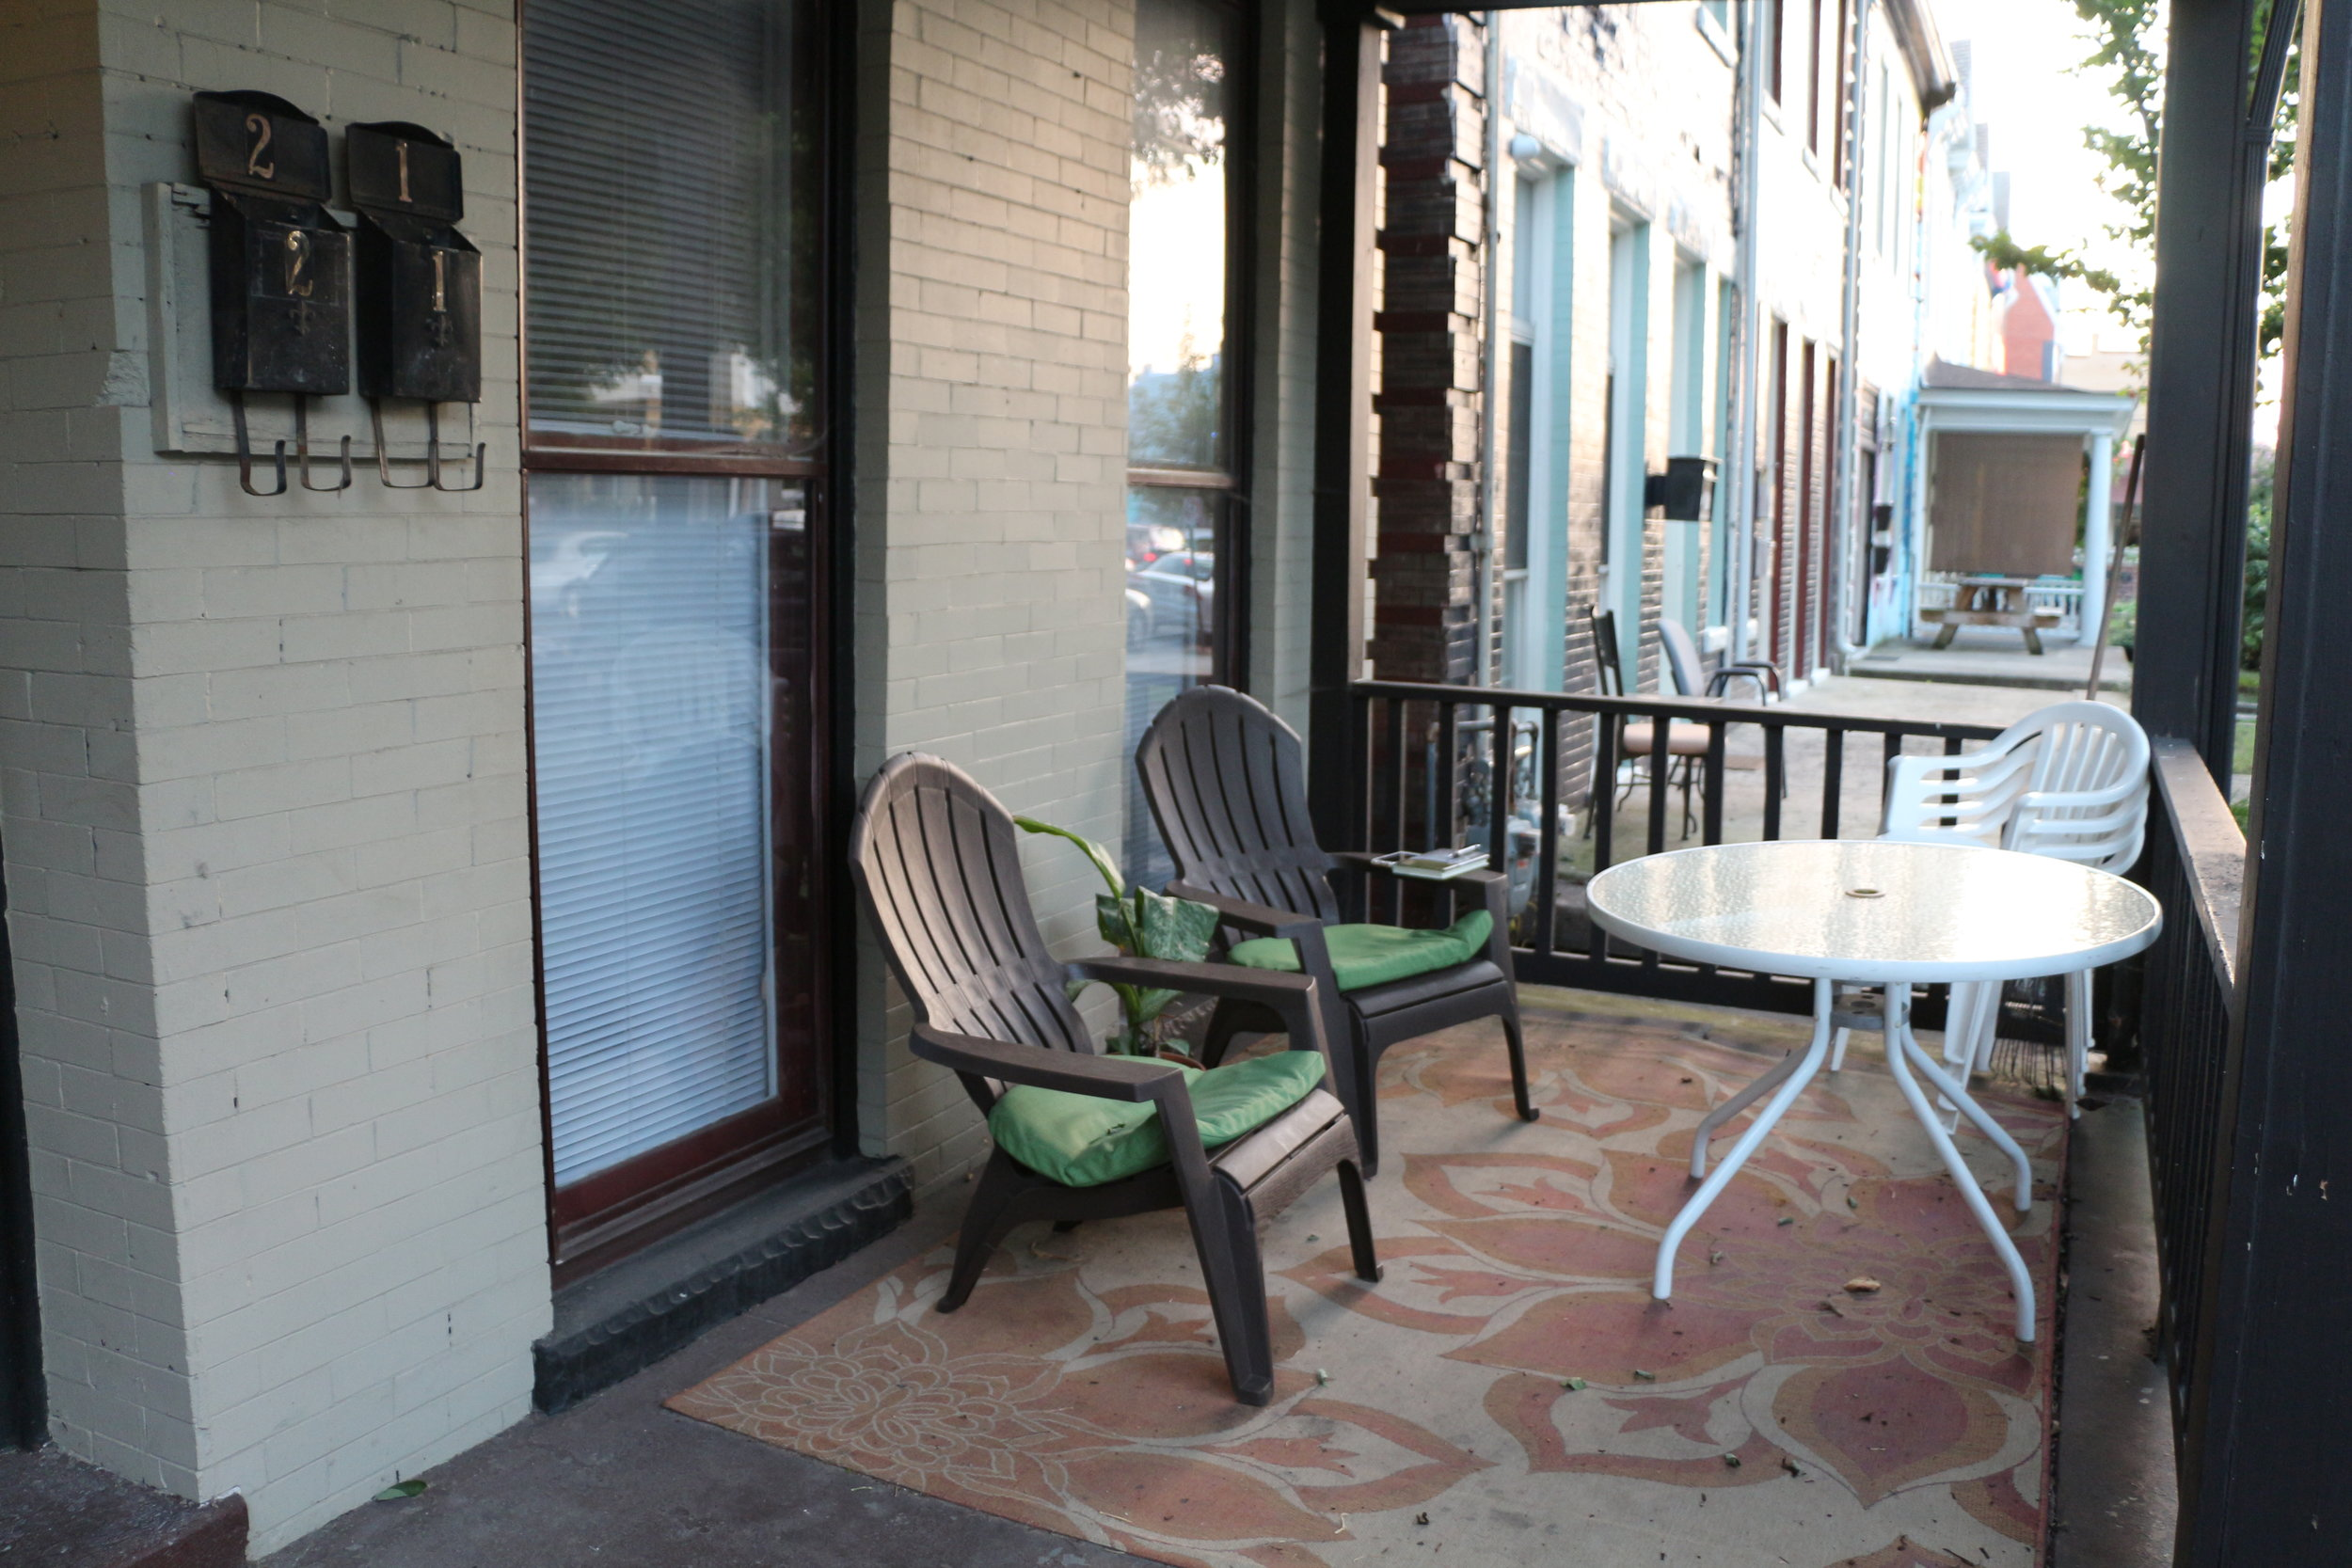 Our front porch!